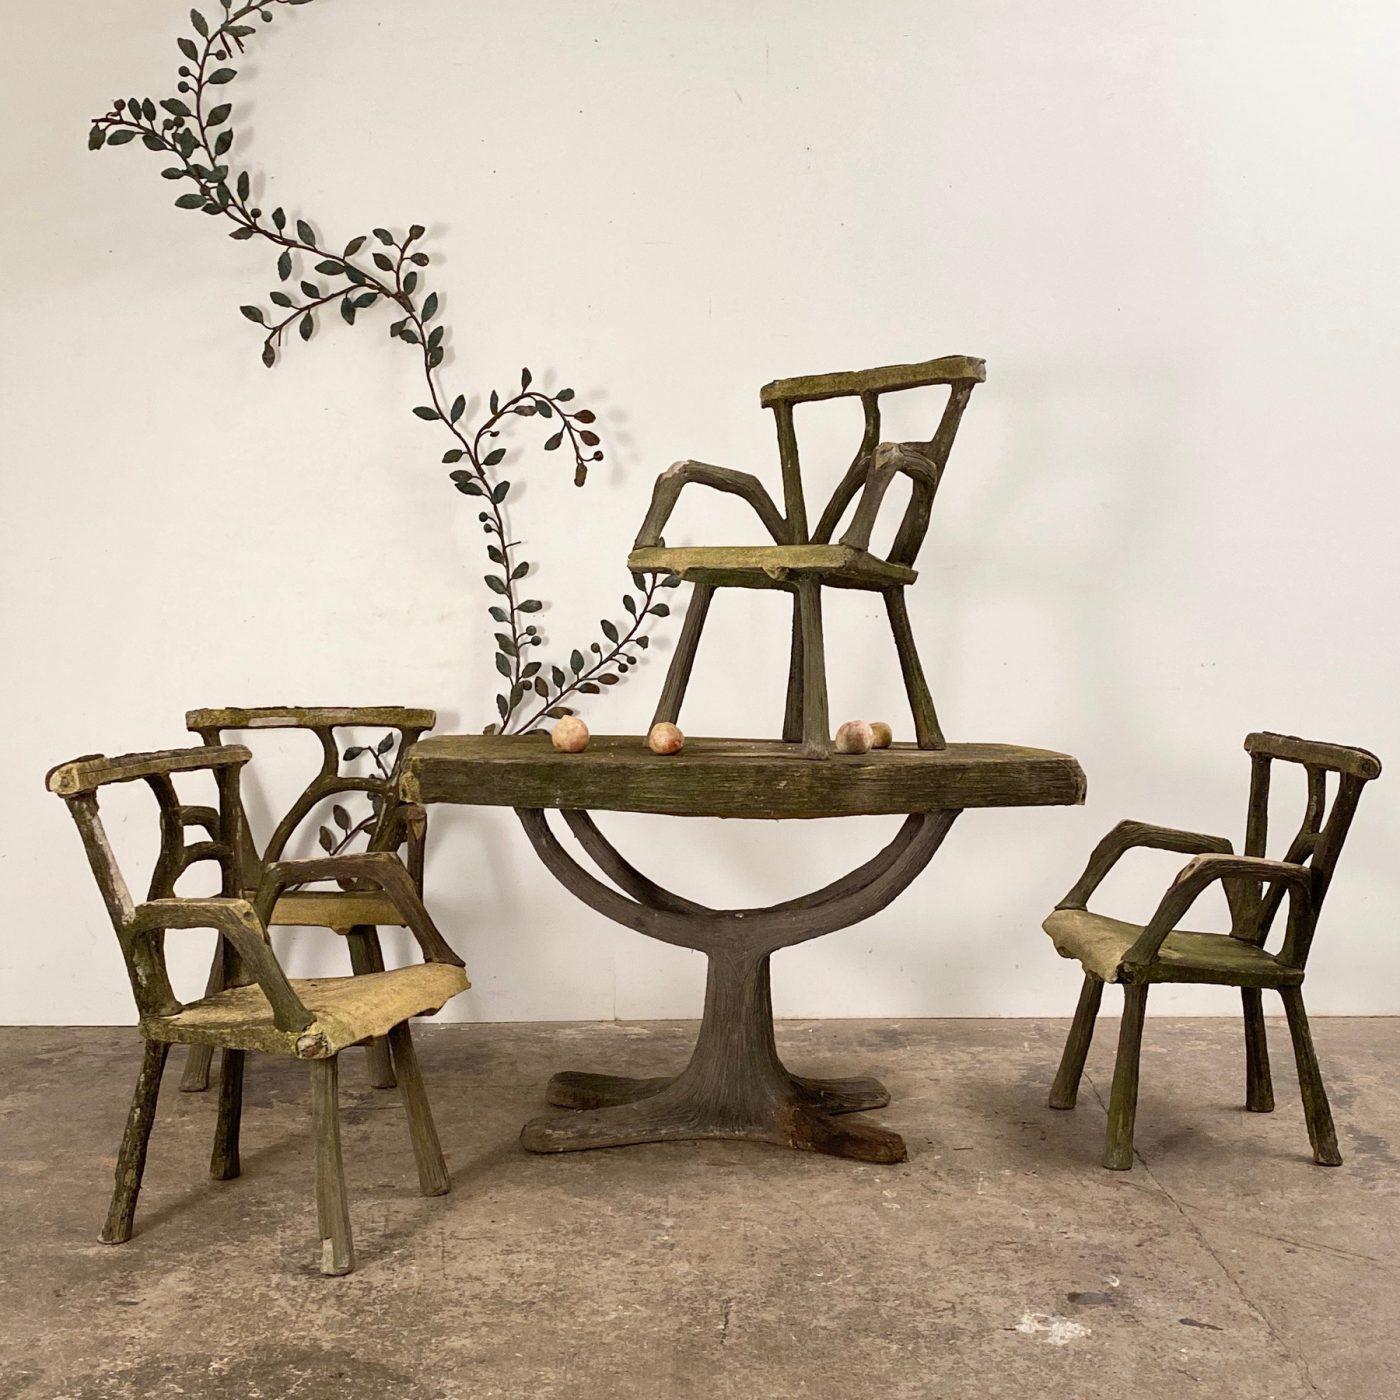 objet-vagabond-garden-set0006